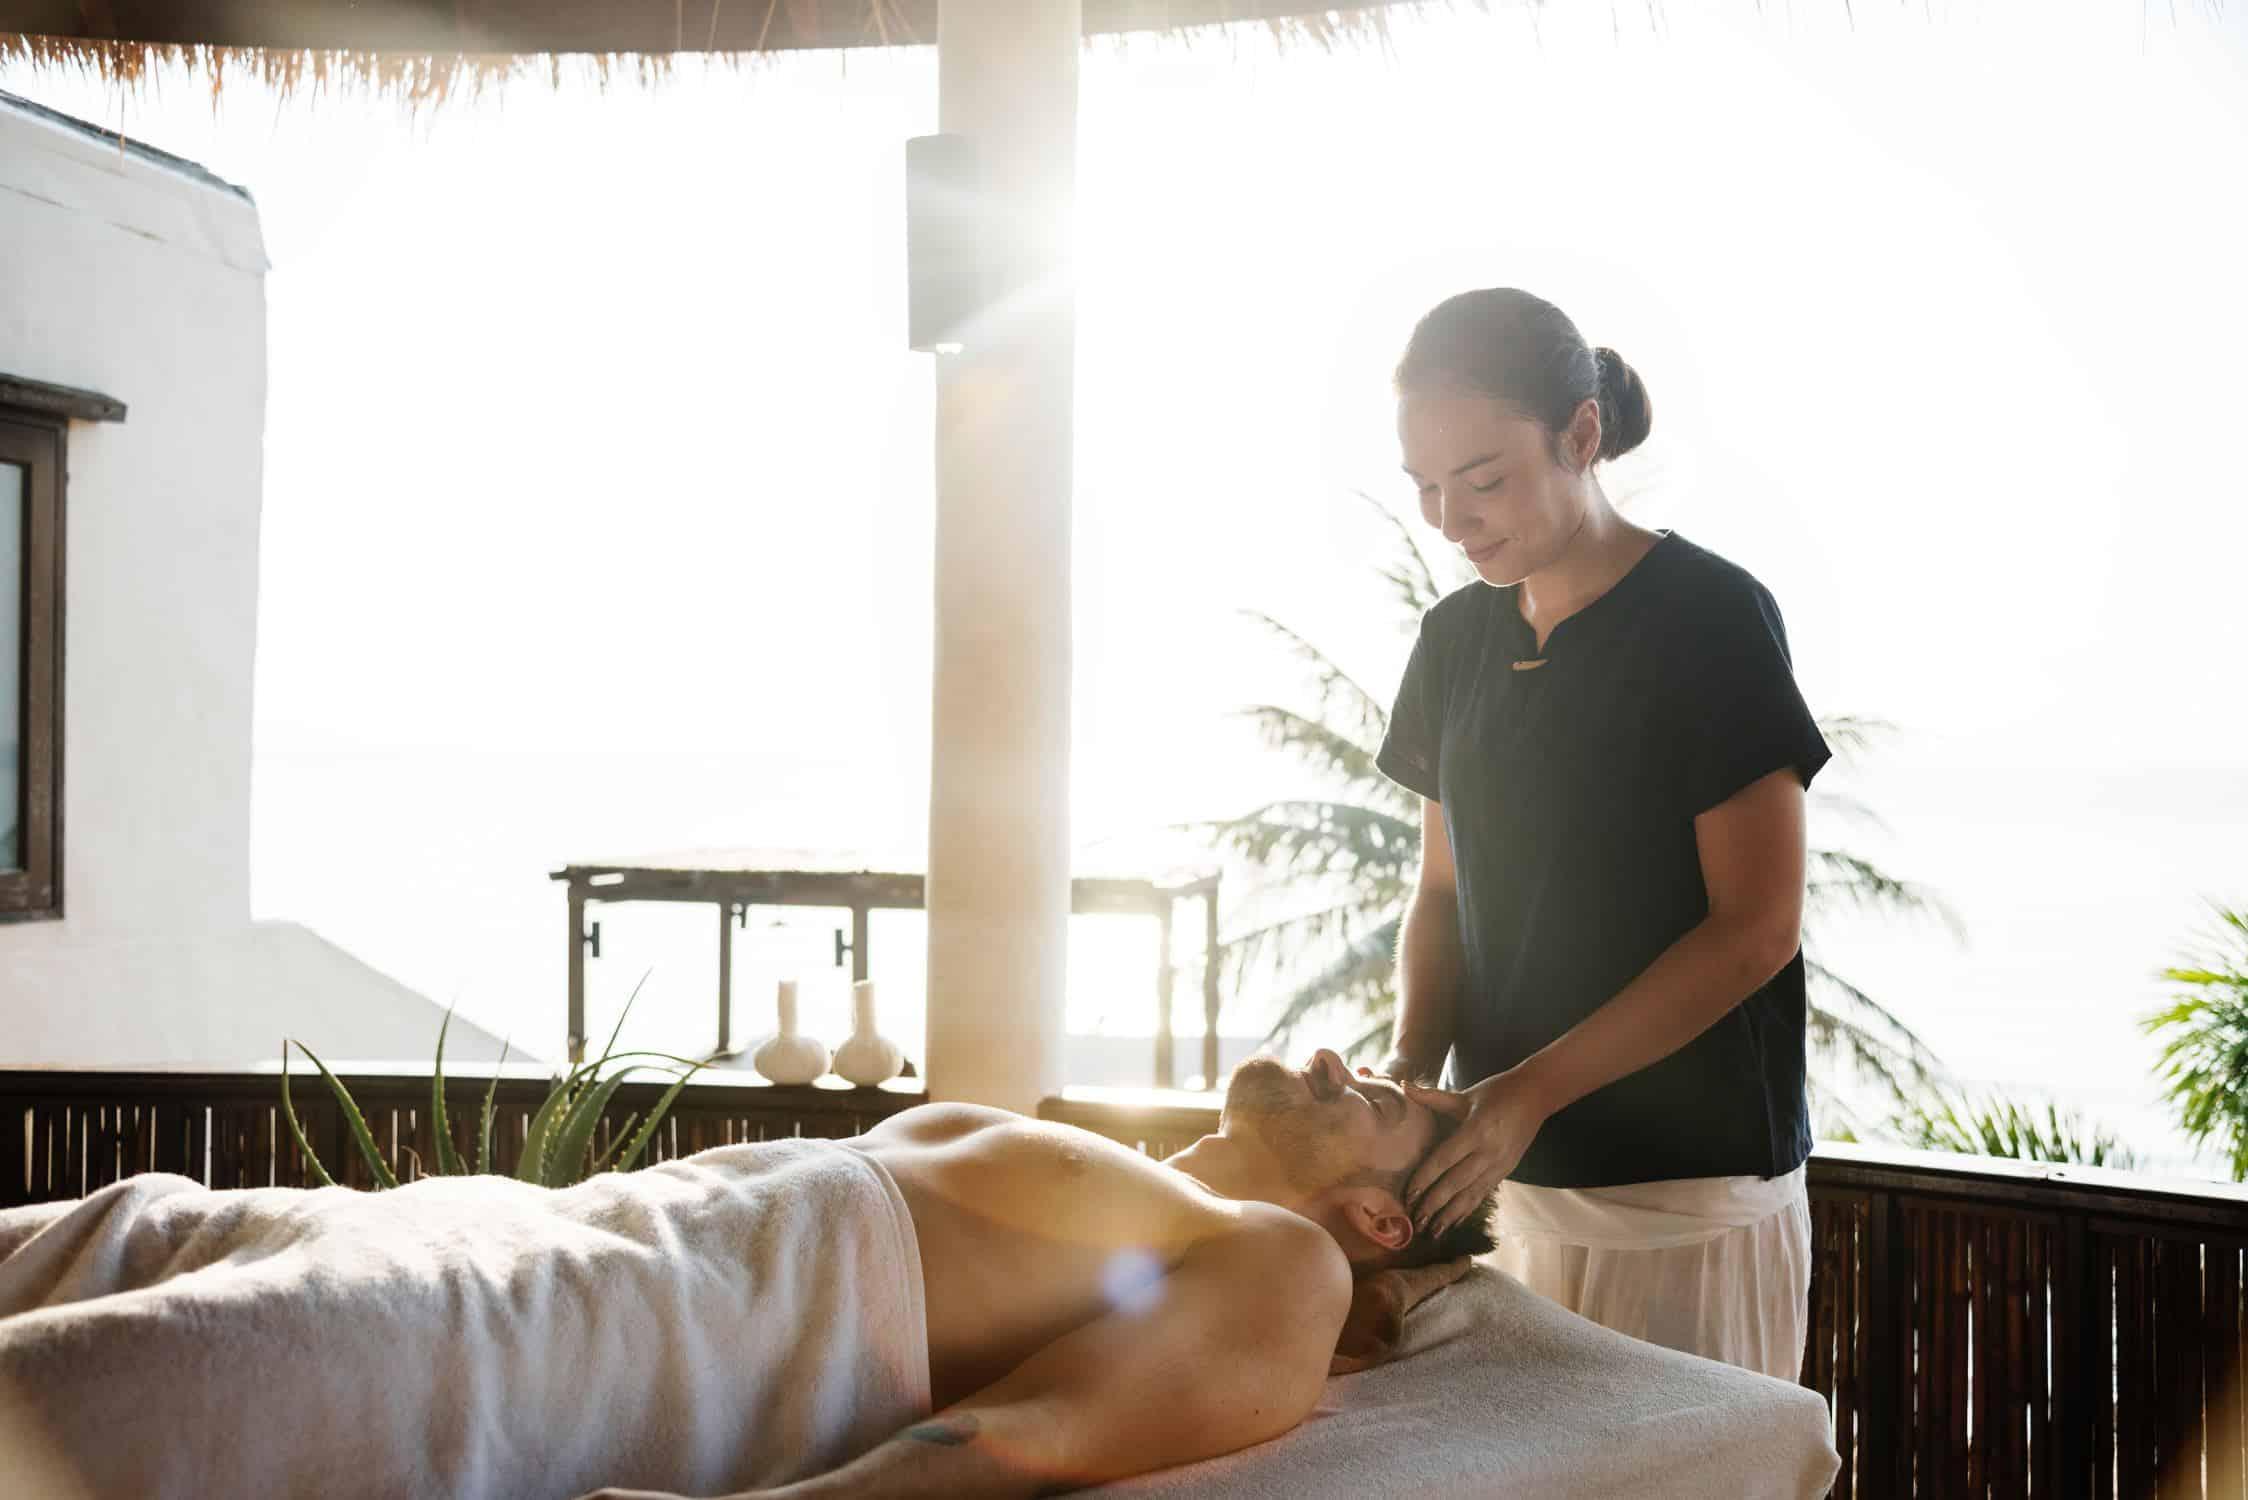 Massage therapist massaging man's head